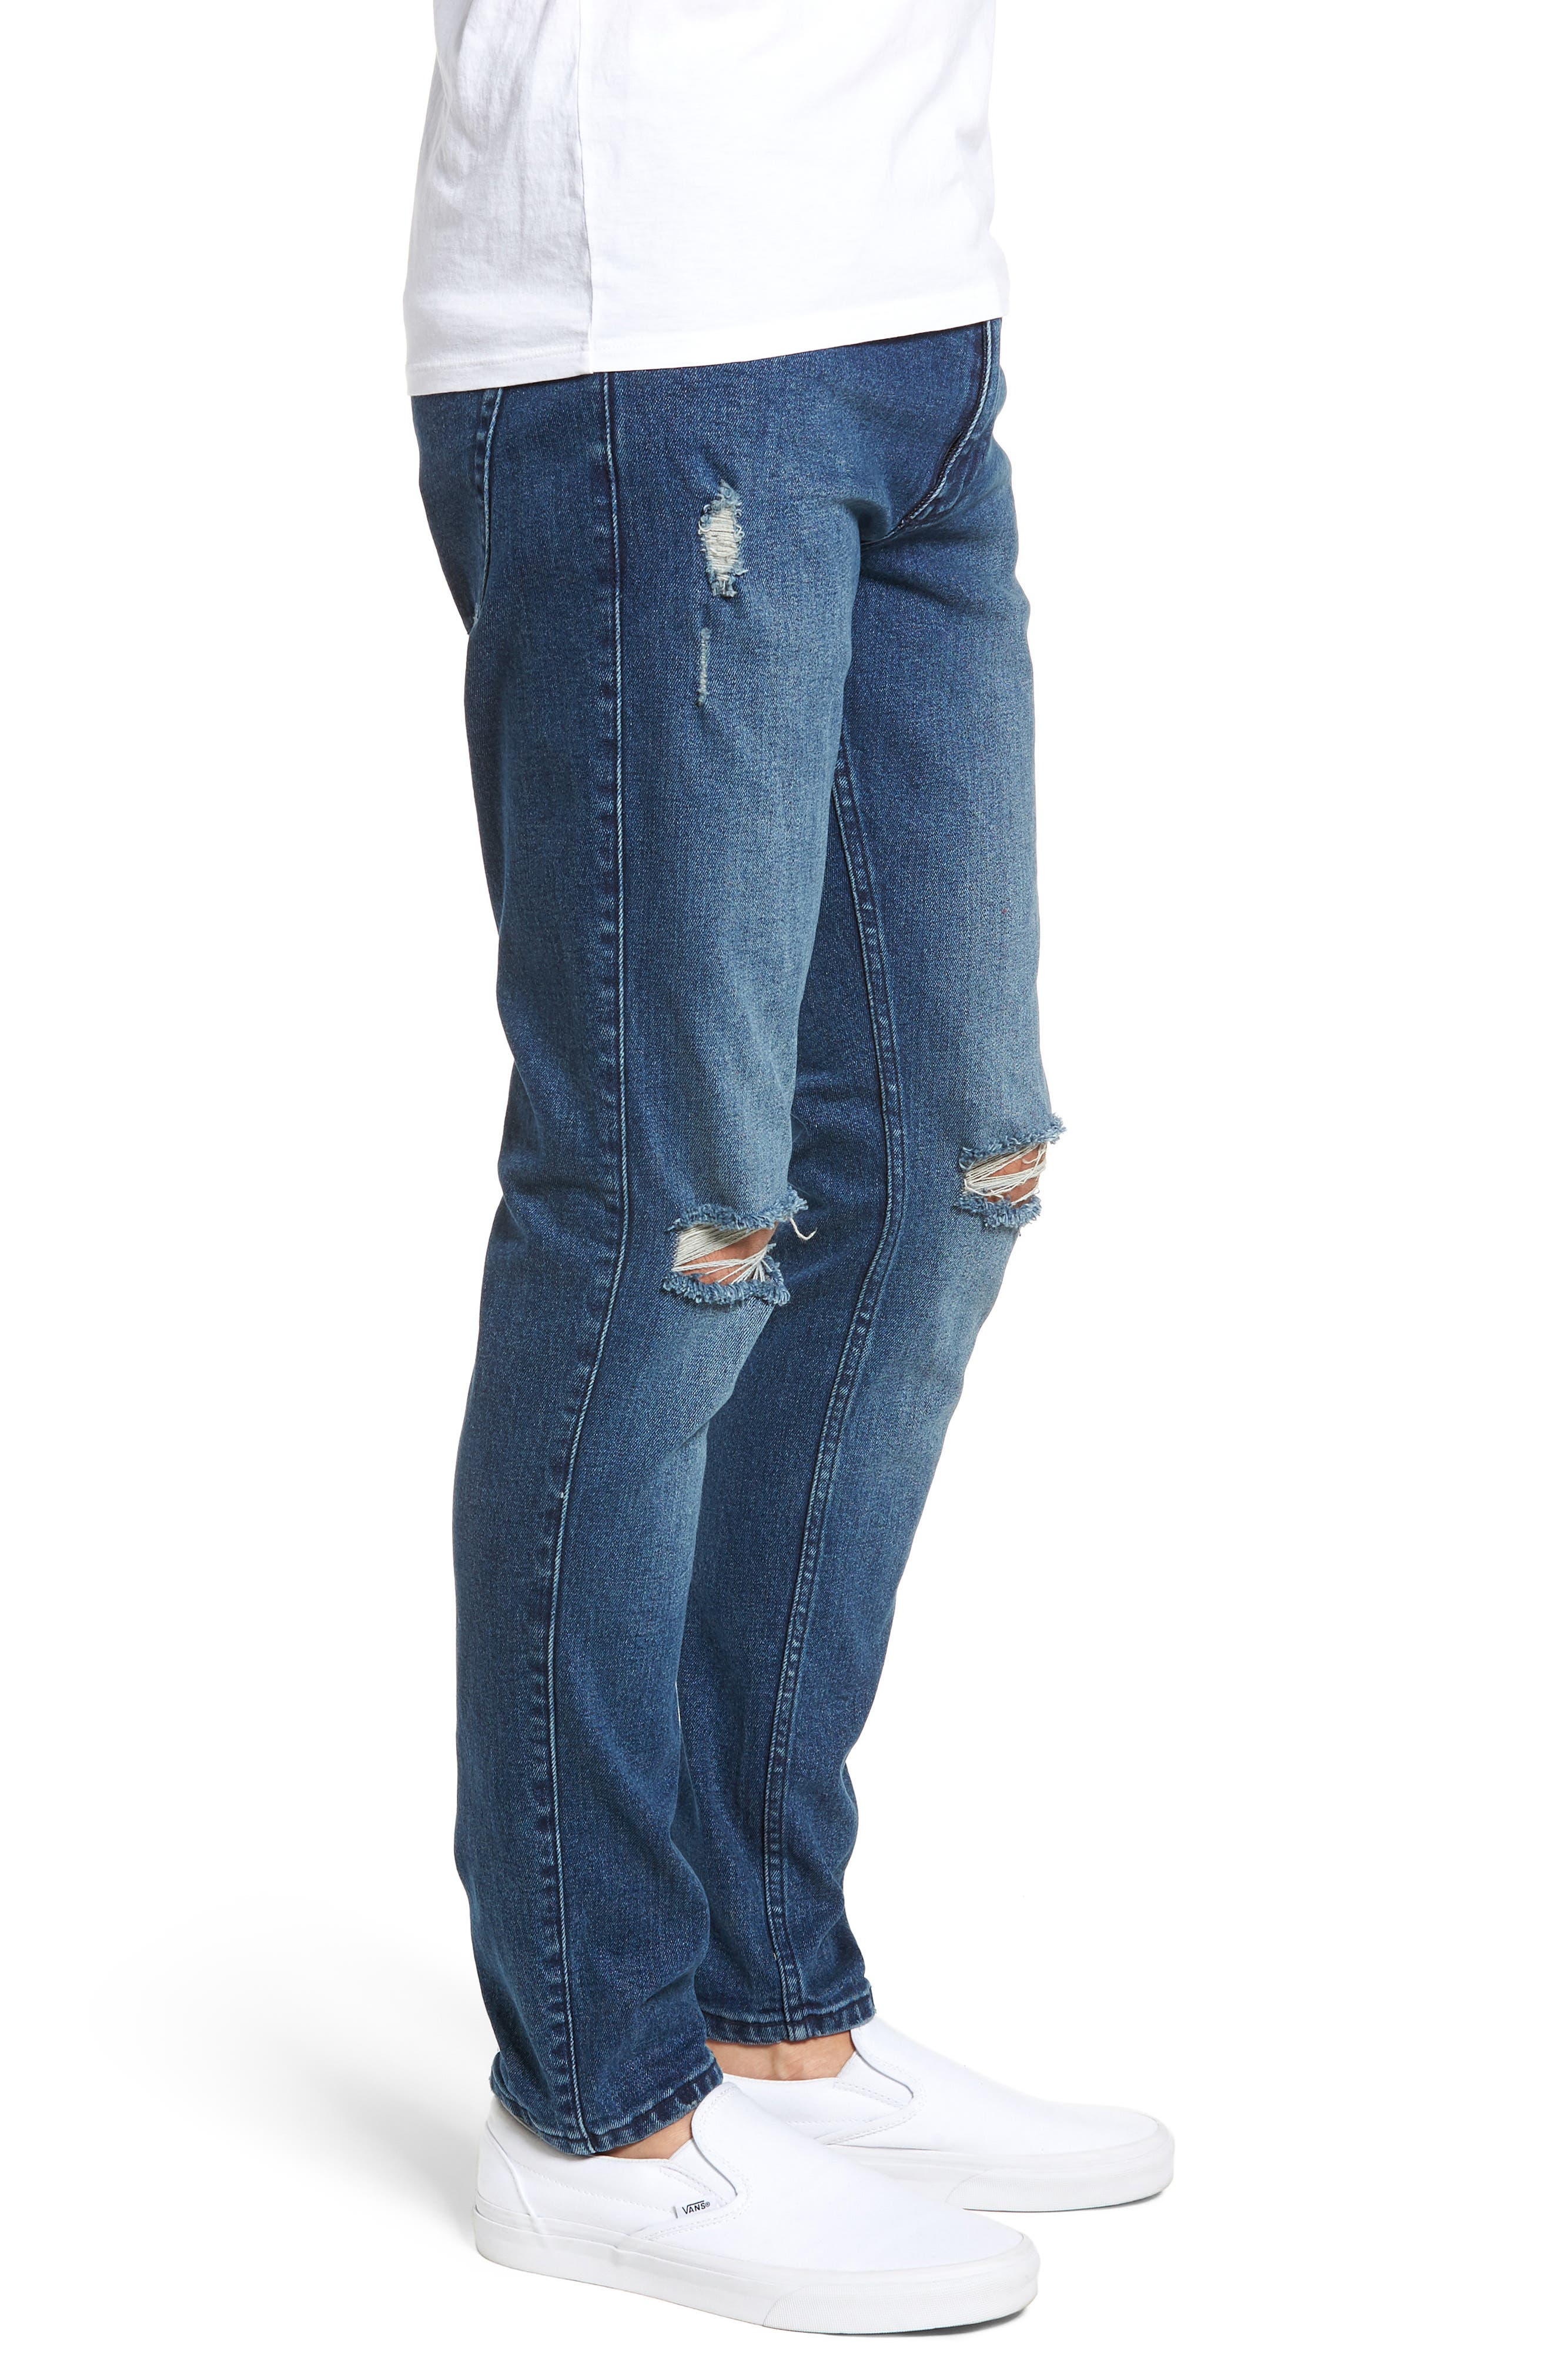 Clark Slim Straight Leg Jeans,                             Alternate thumbnail 3, color,                             WORN ASH BLUE DAMAGED